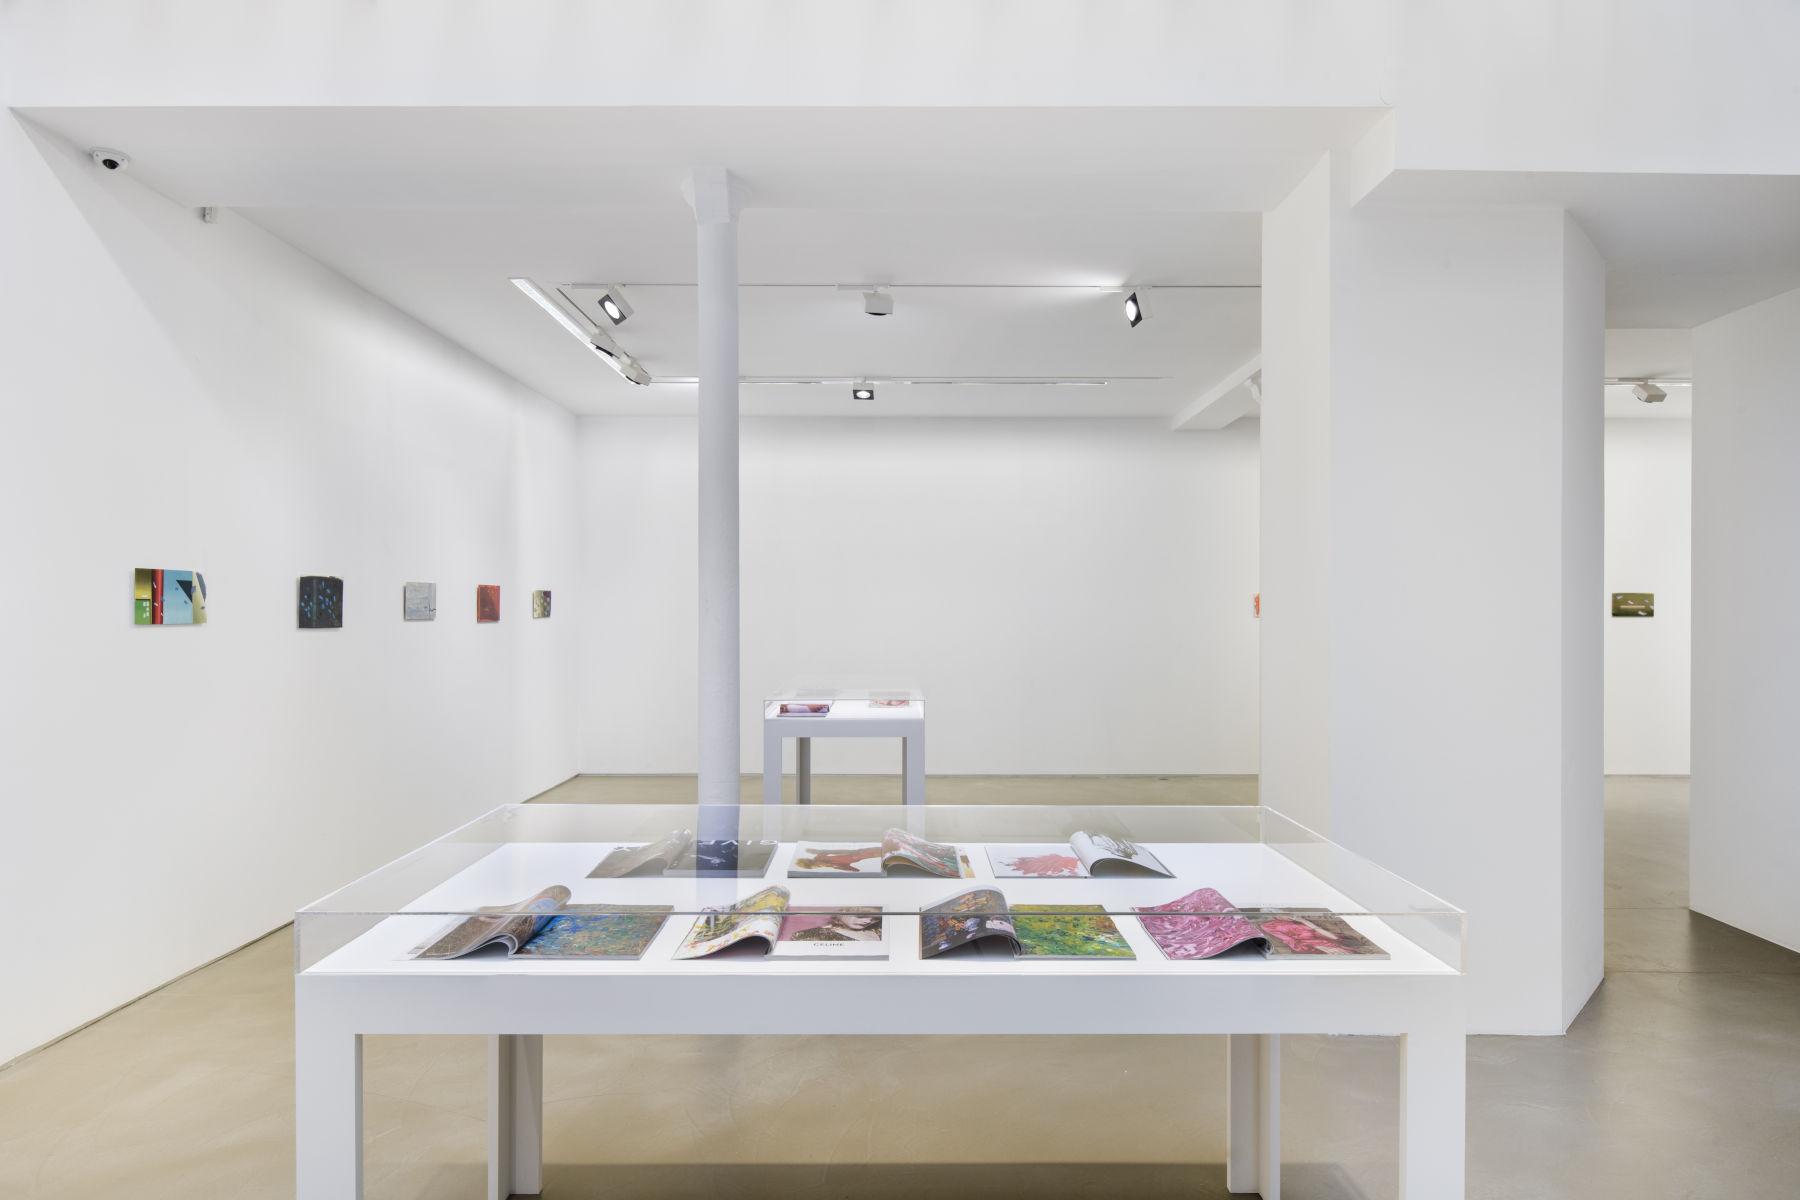 Galerie Chantal Crousel Clement Rodzielski 1